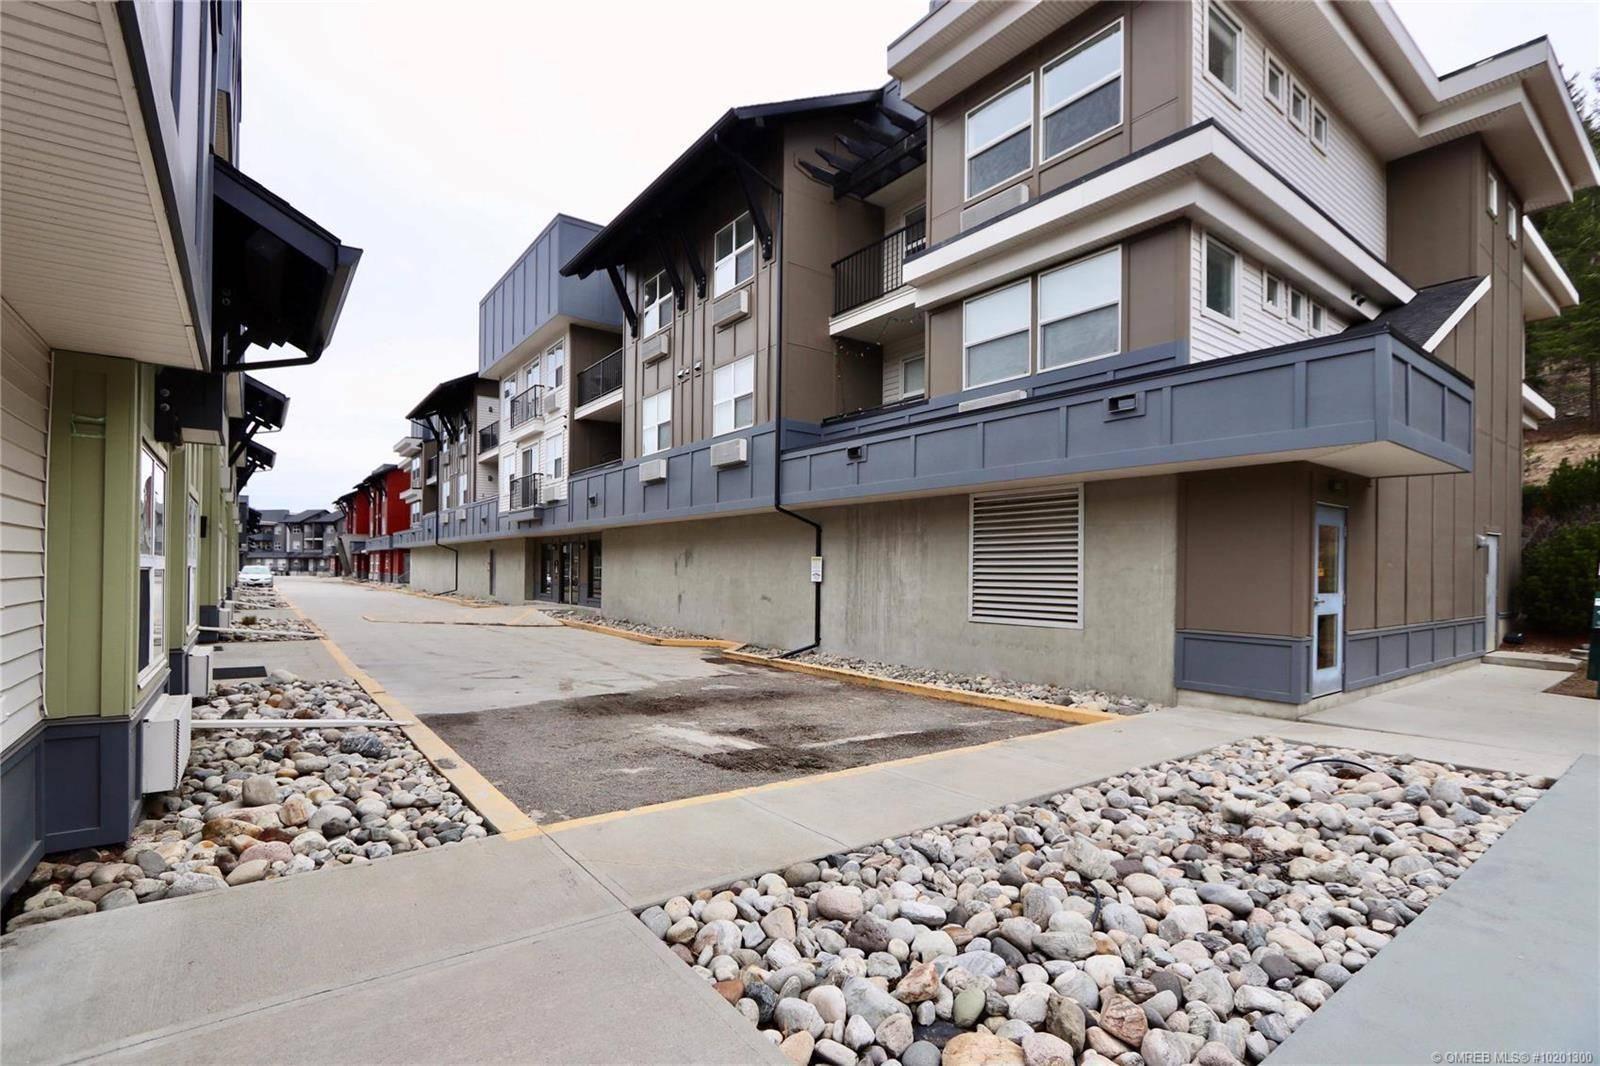 Condo for sale at 1483 Glenmore Rd North Unit 303 Kelowna British Columbia - MLS: 10201300